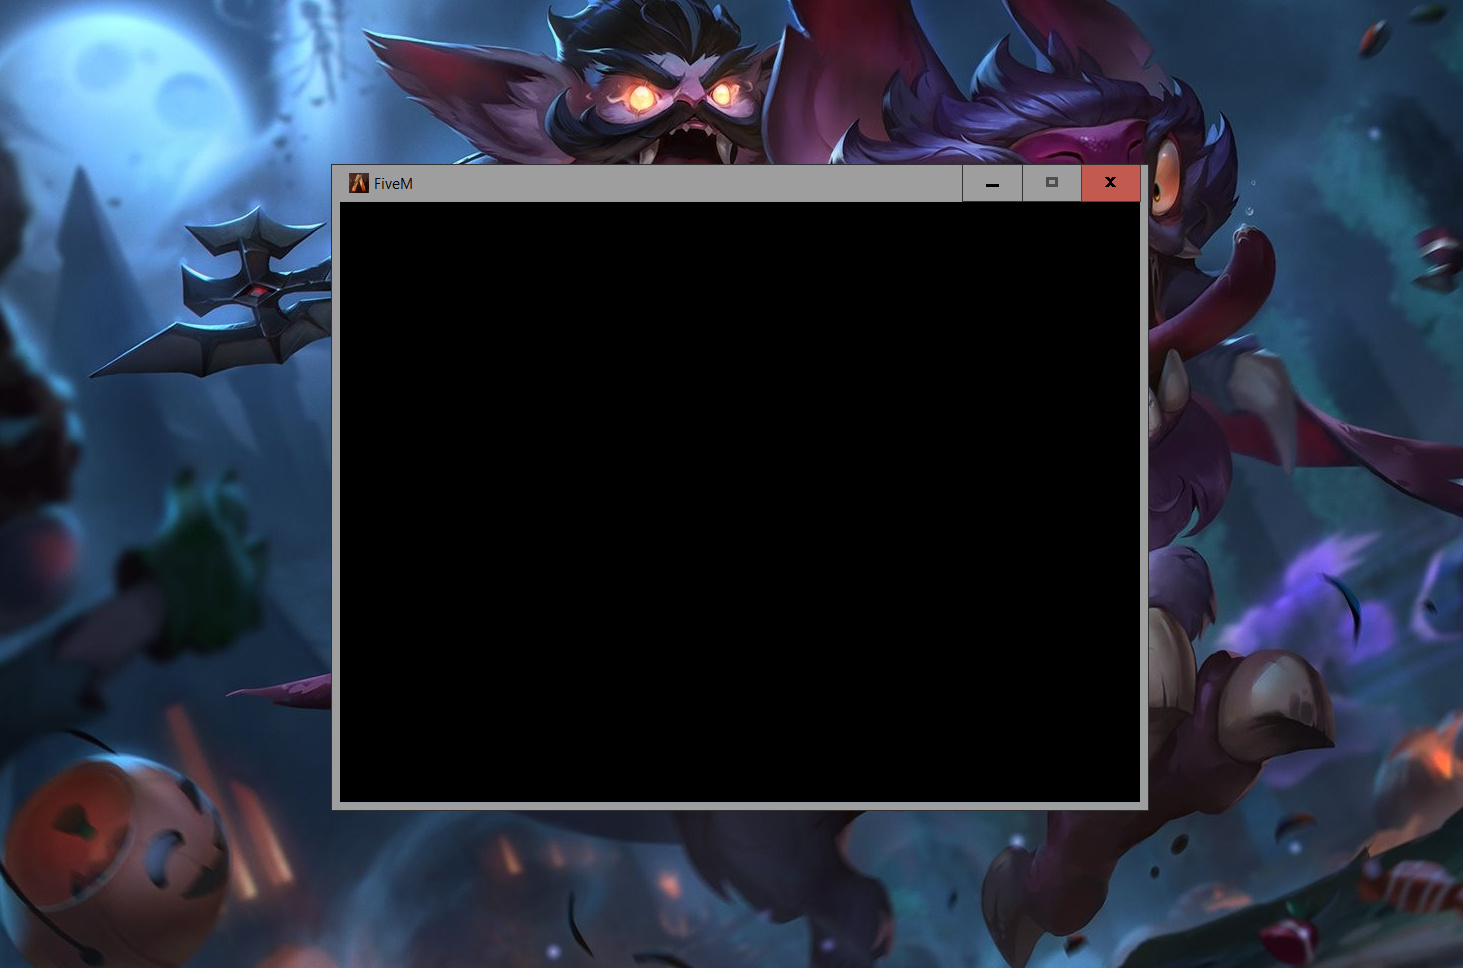 Black Screen - FiveM - Technical Support - FiveM